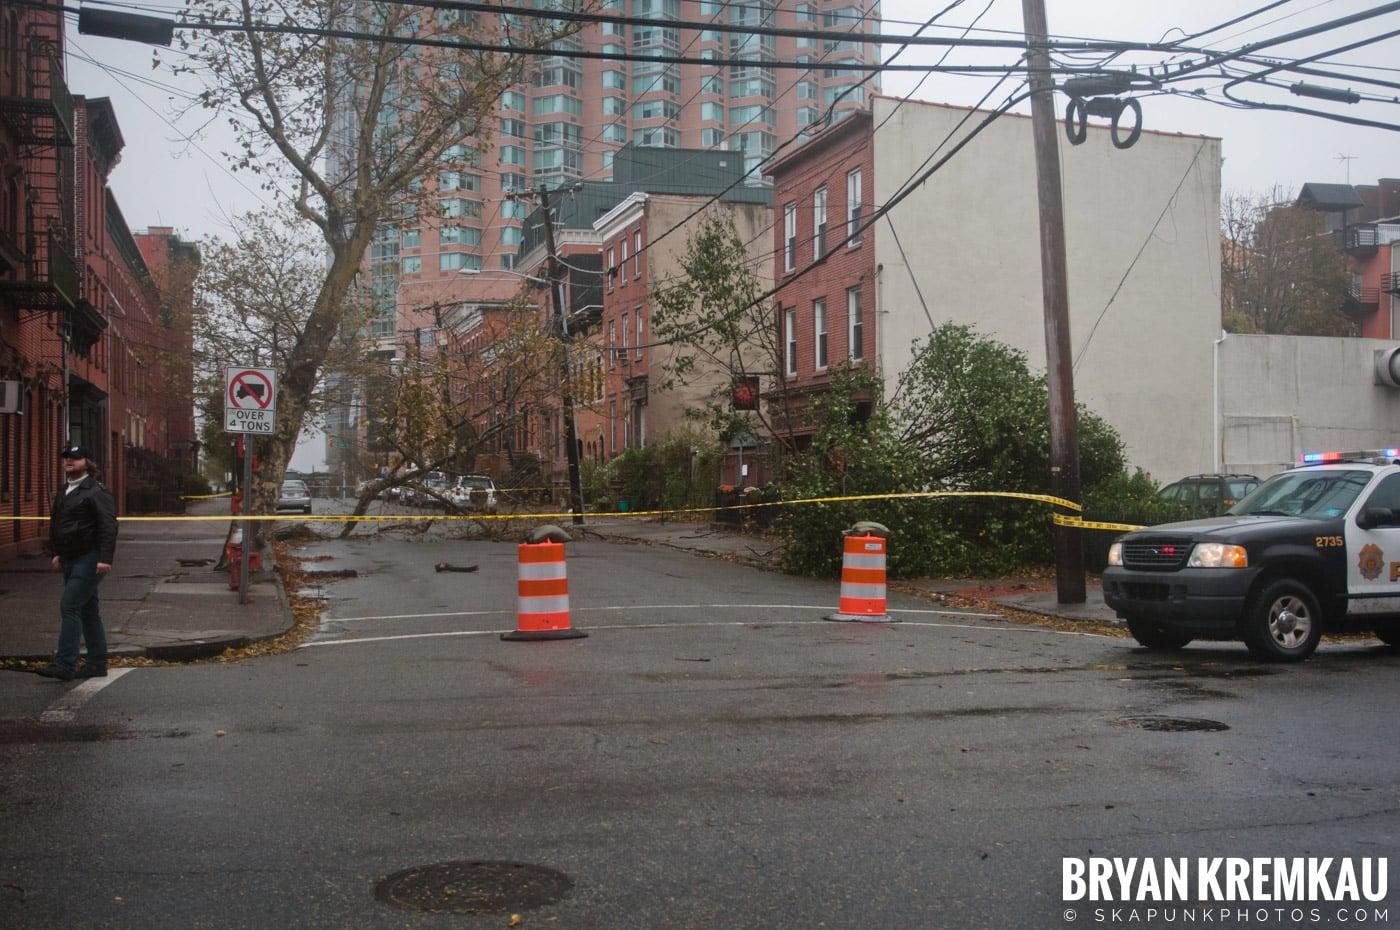 Hurricane Sandy 2012 @ Paulus Hook, Jersey City - 10.29.12 - 10.30.12 (28)